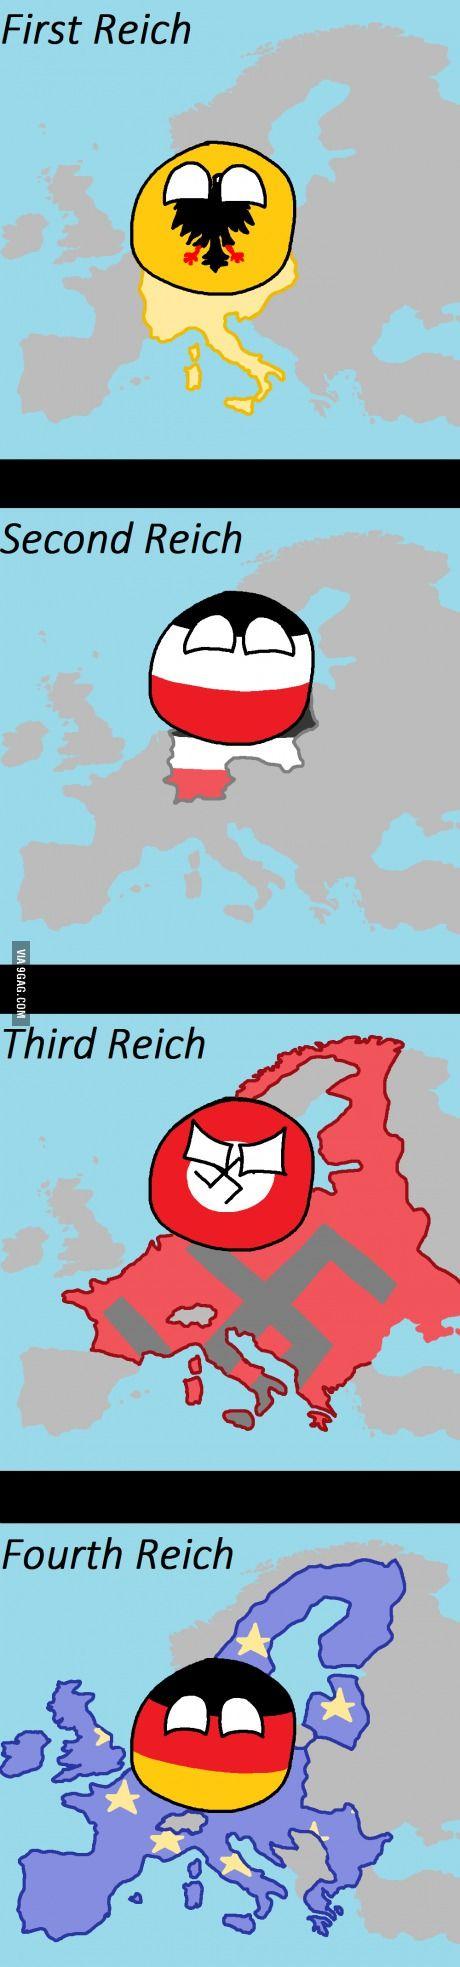 Fourth Reich! *evil laugh*